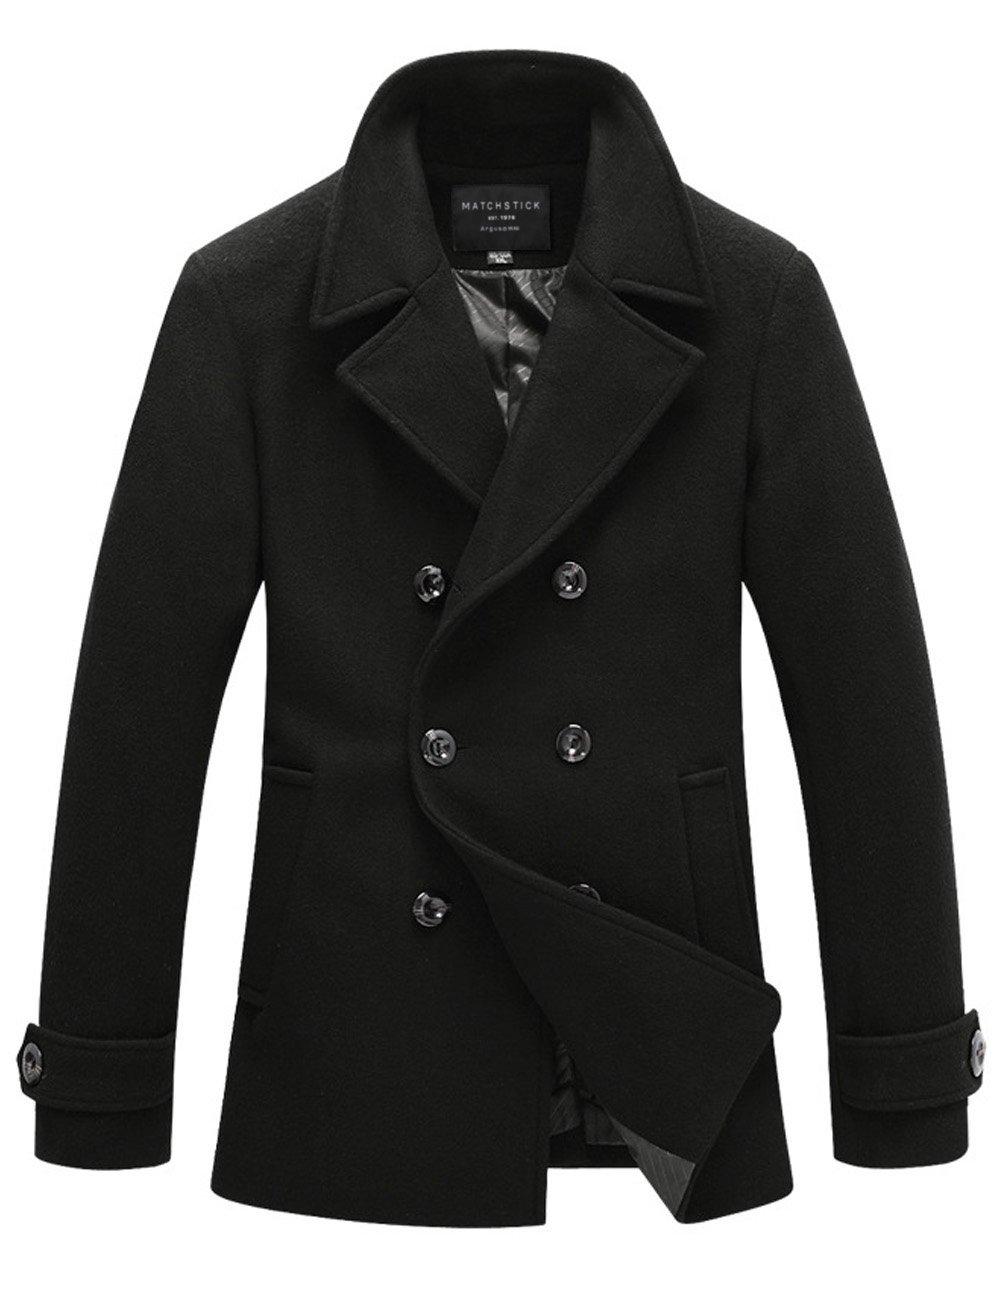 Match Mens Wool Blend Classic Pea Coat Winter Coats (010 Black, Medium) by Match